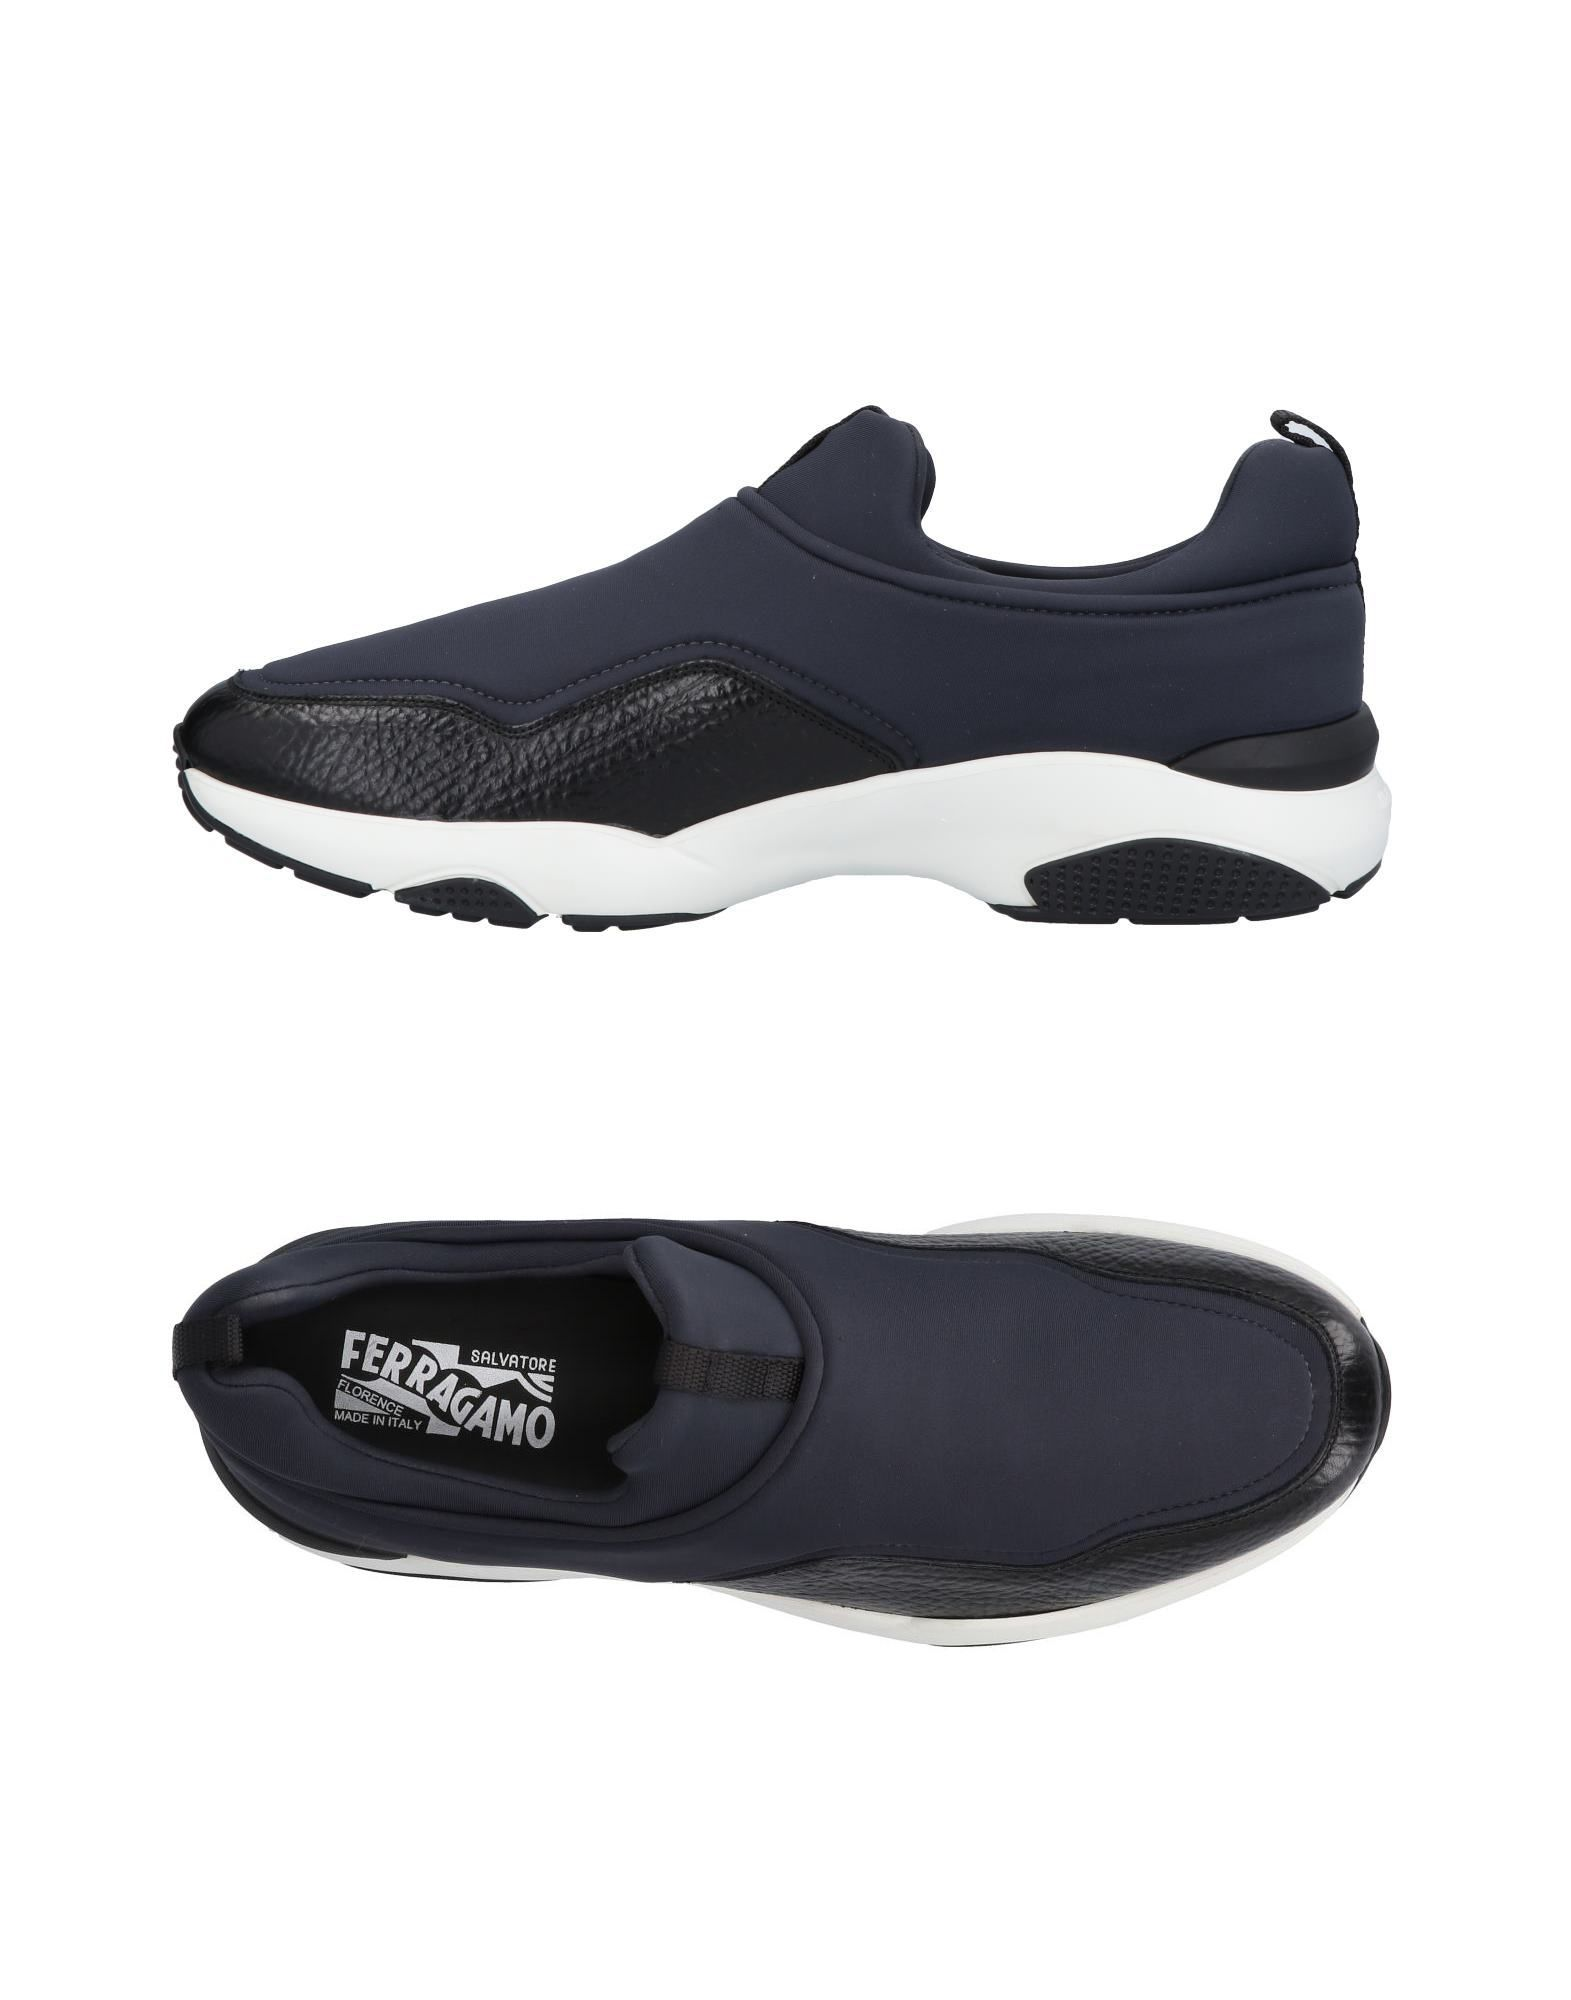 Salvatore Ferragamo Sneakers Herren  11492812FA Gute Qualität beliebte Schuhe